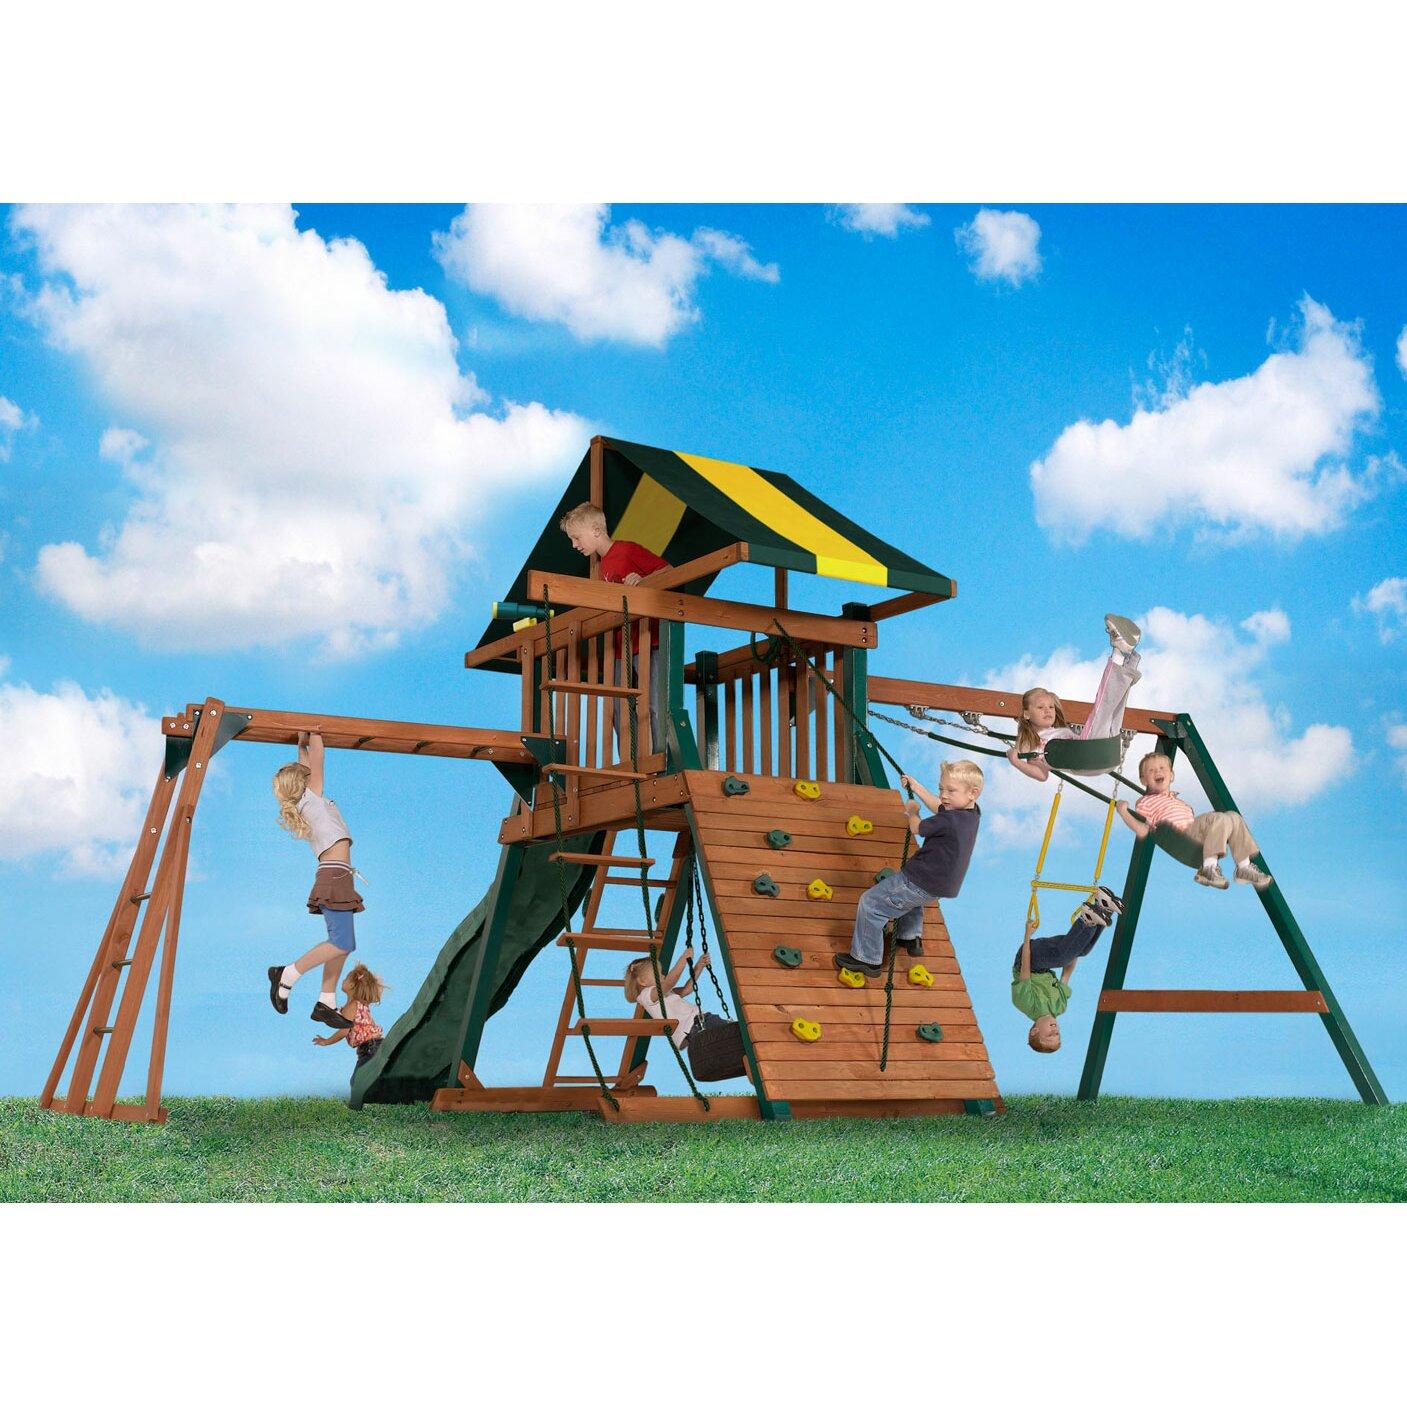 Backyard Play Systems Castle Rock Swing Set & Reviews